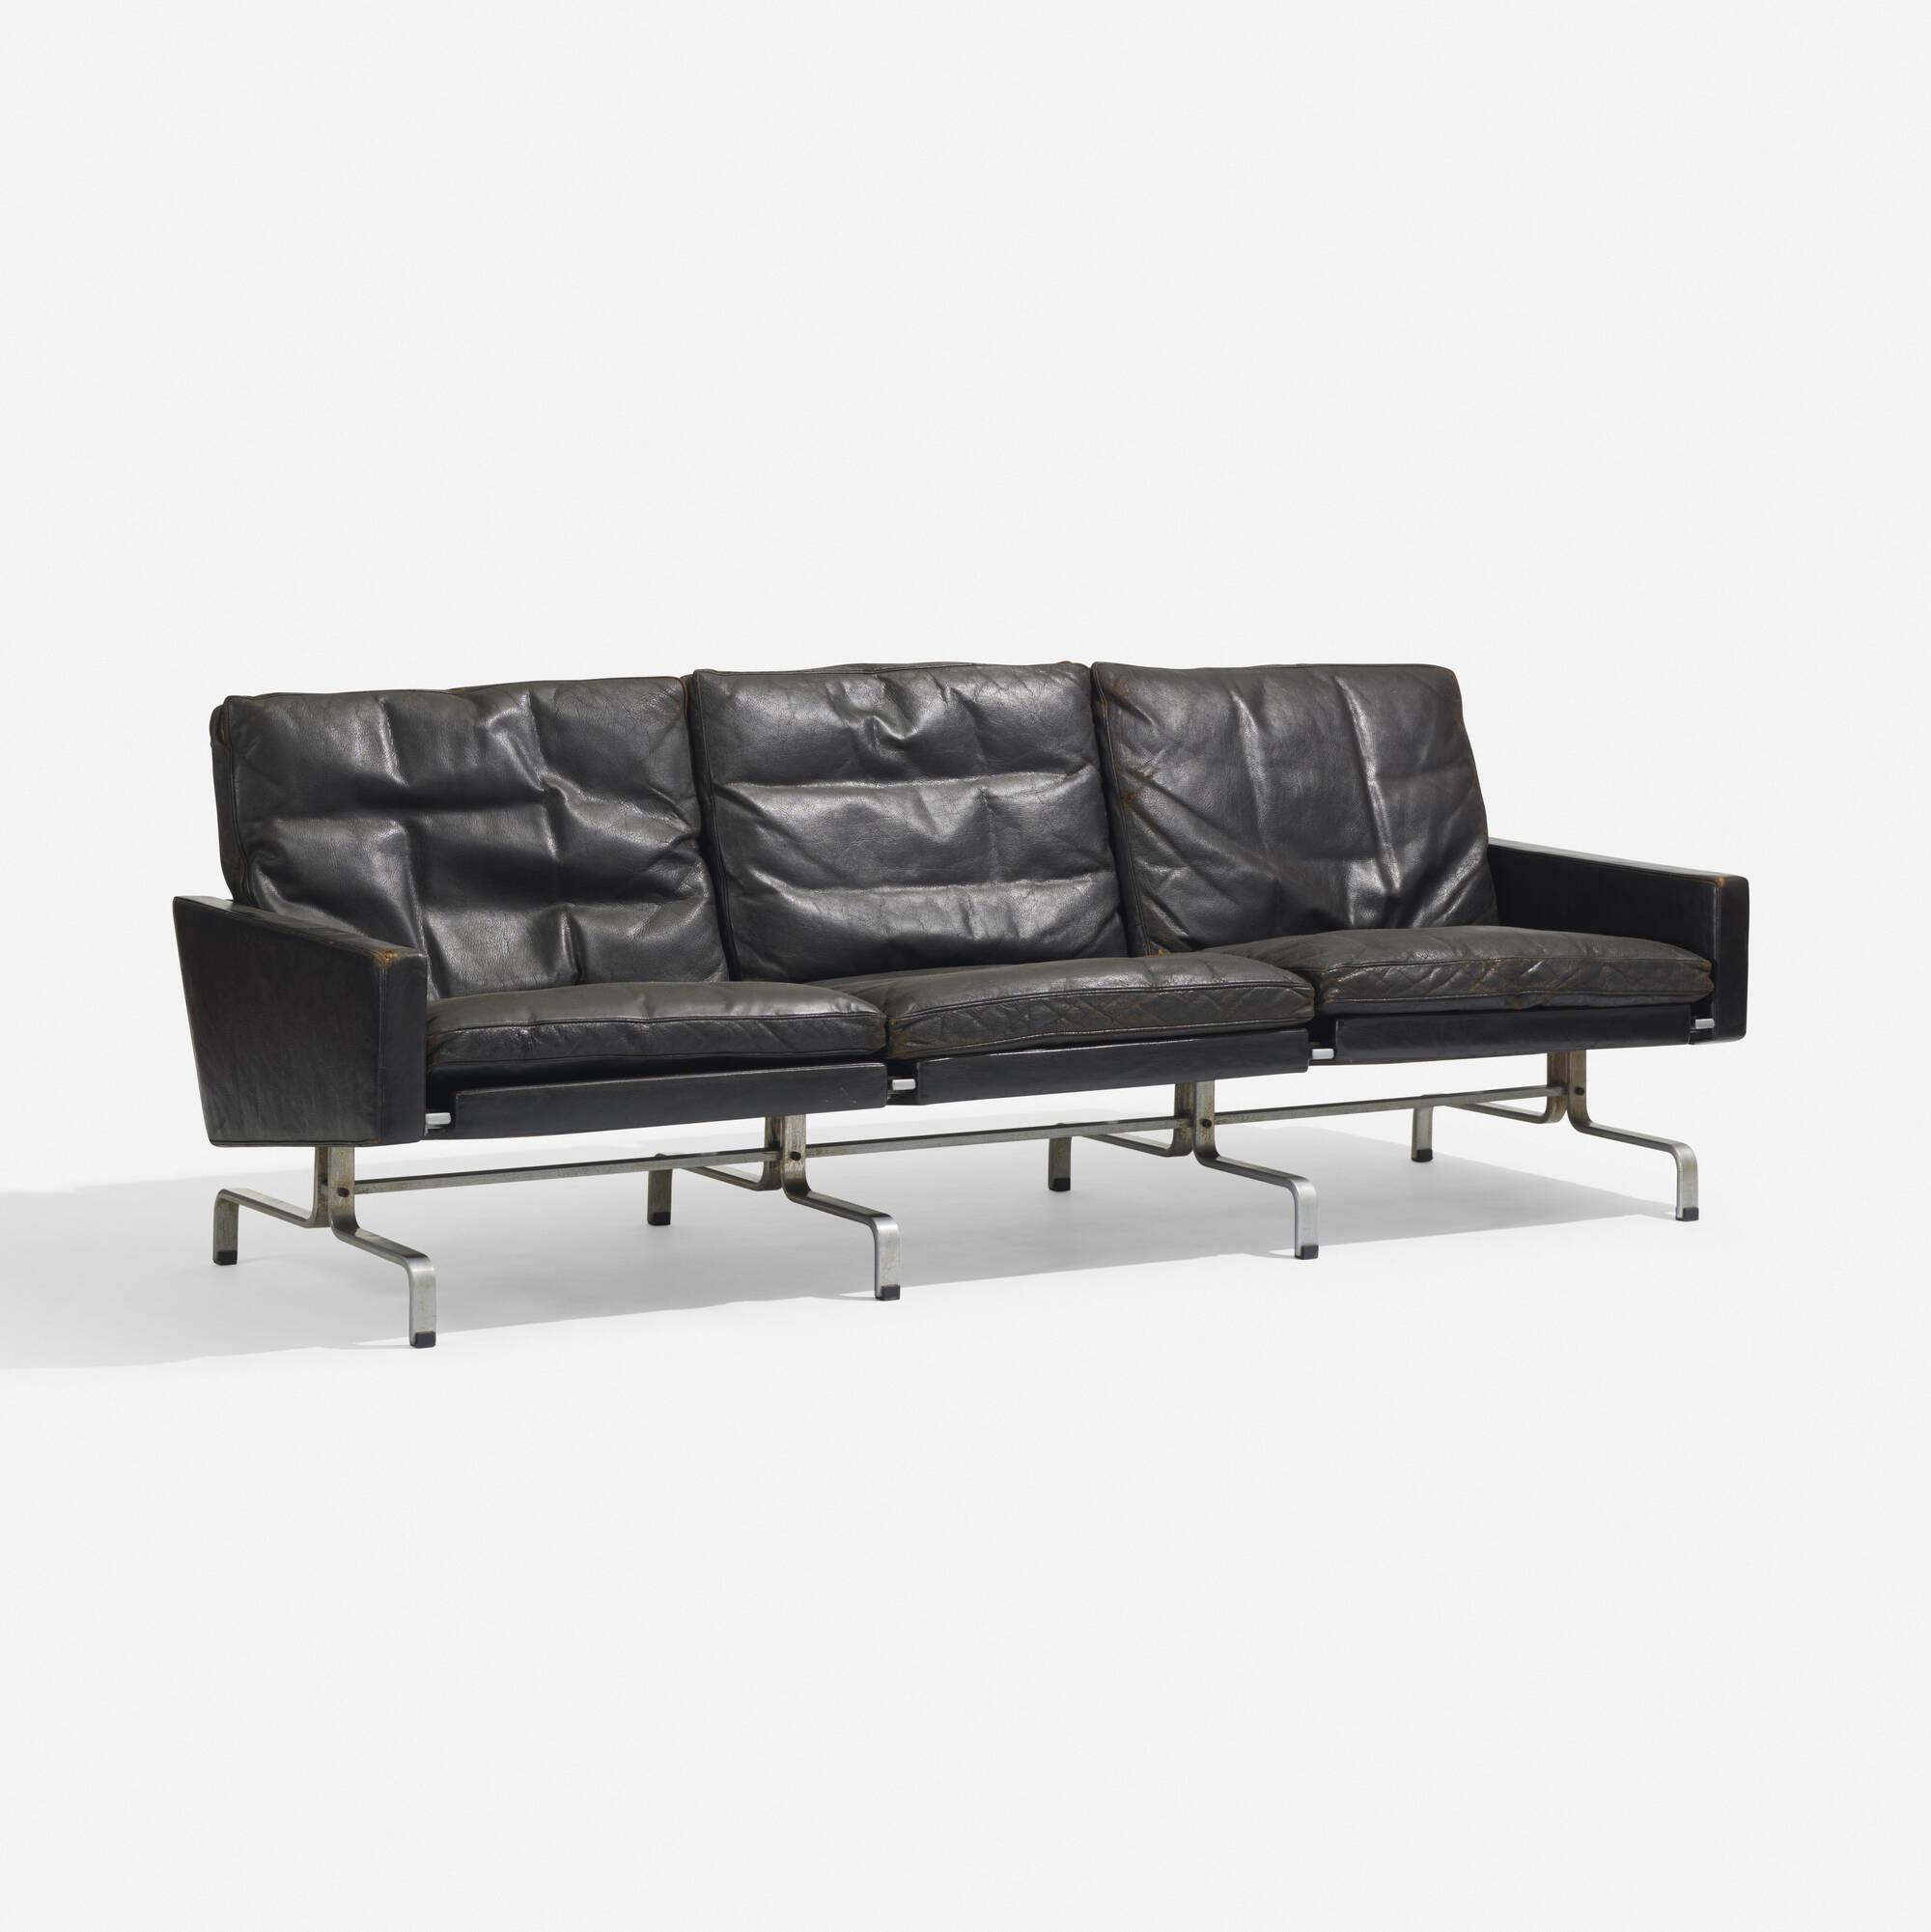 160: POUL KJAERHOLM, PK 31/3 sofa < Scandinavian Design, 18 May 2017 ...